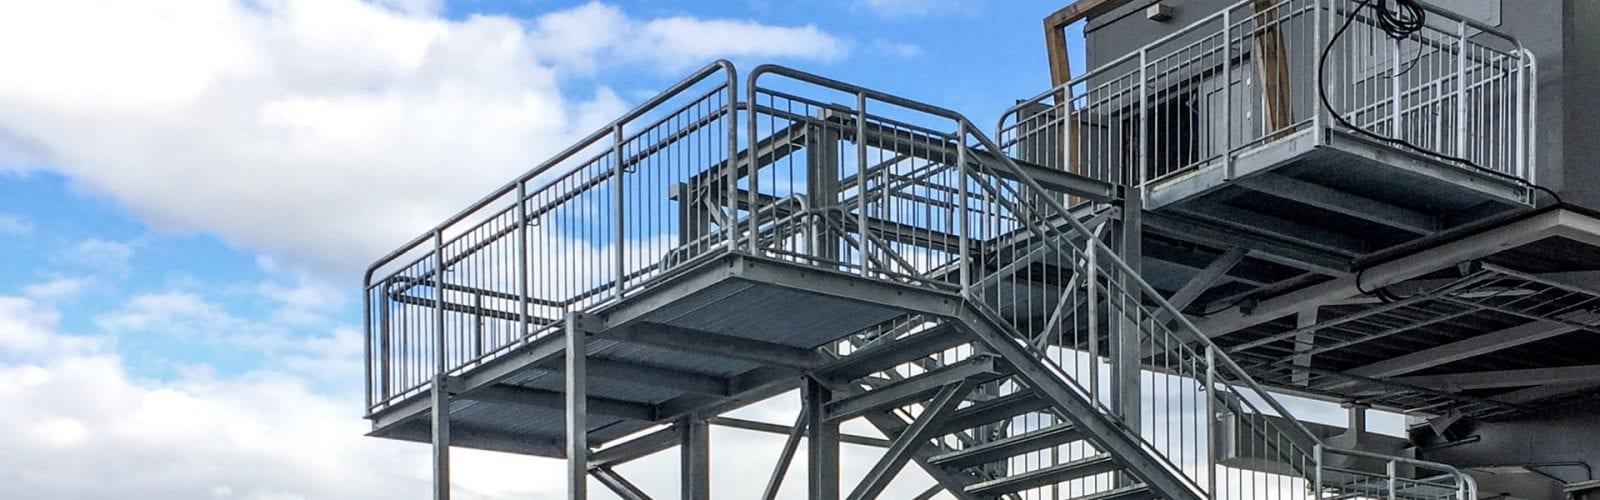 barierki i balustrady